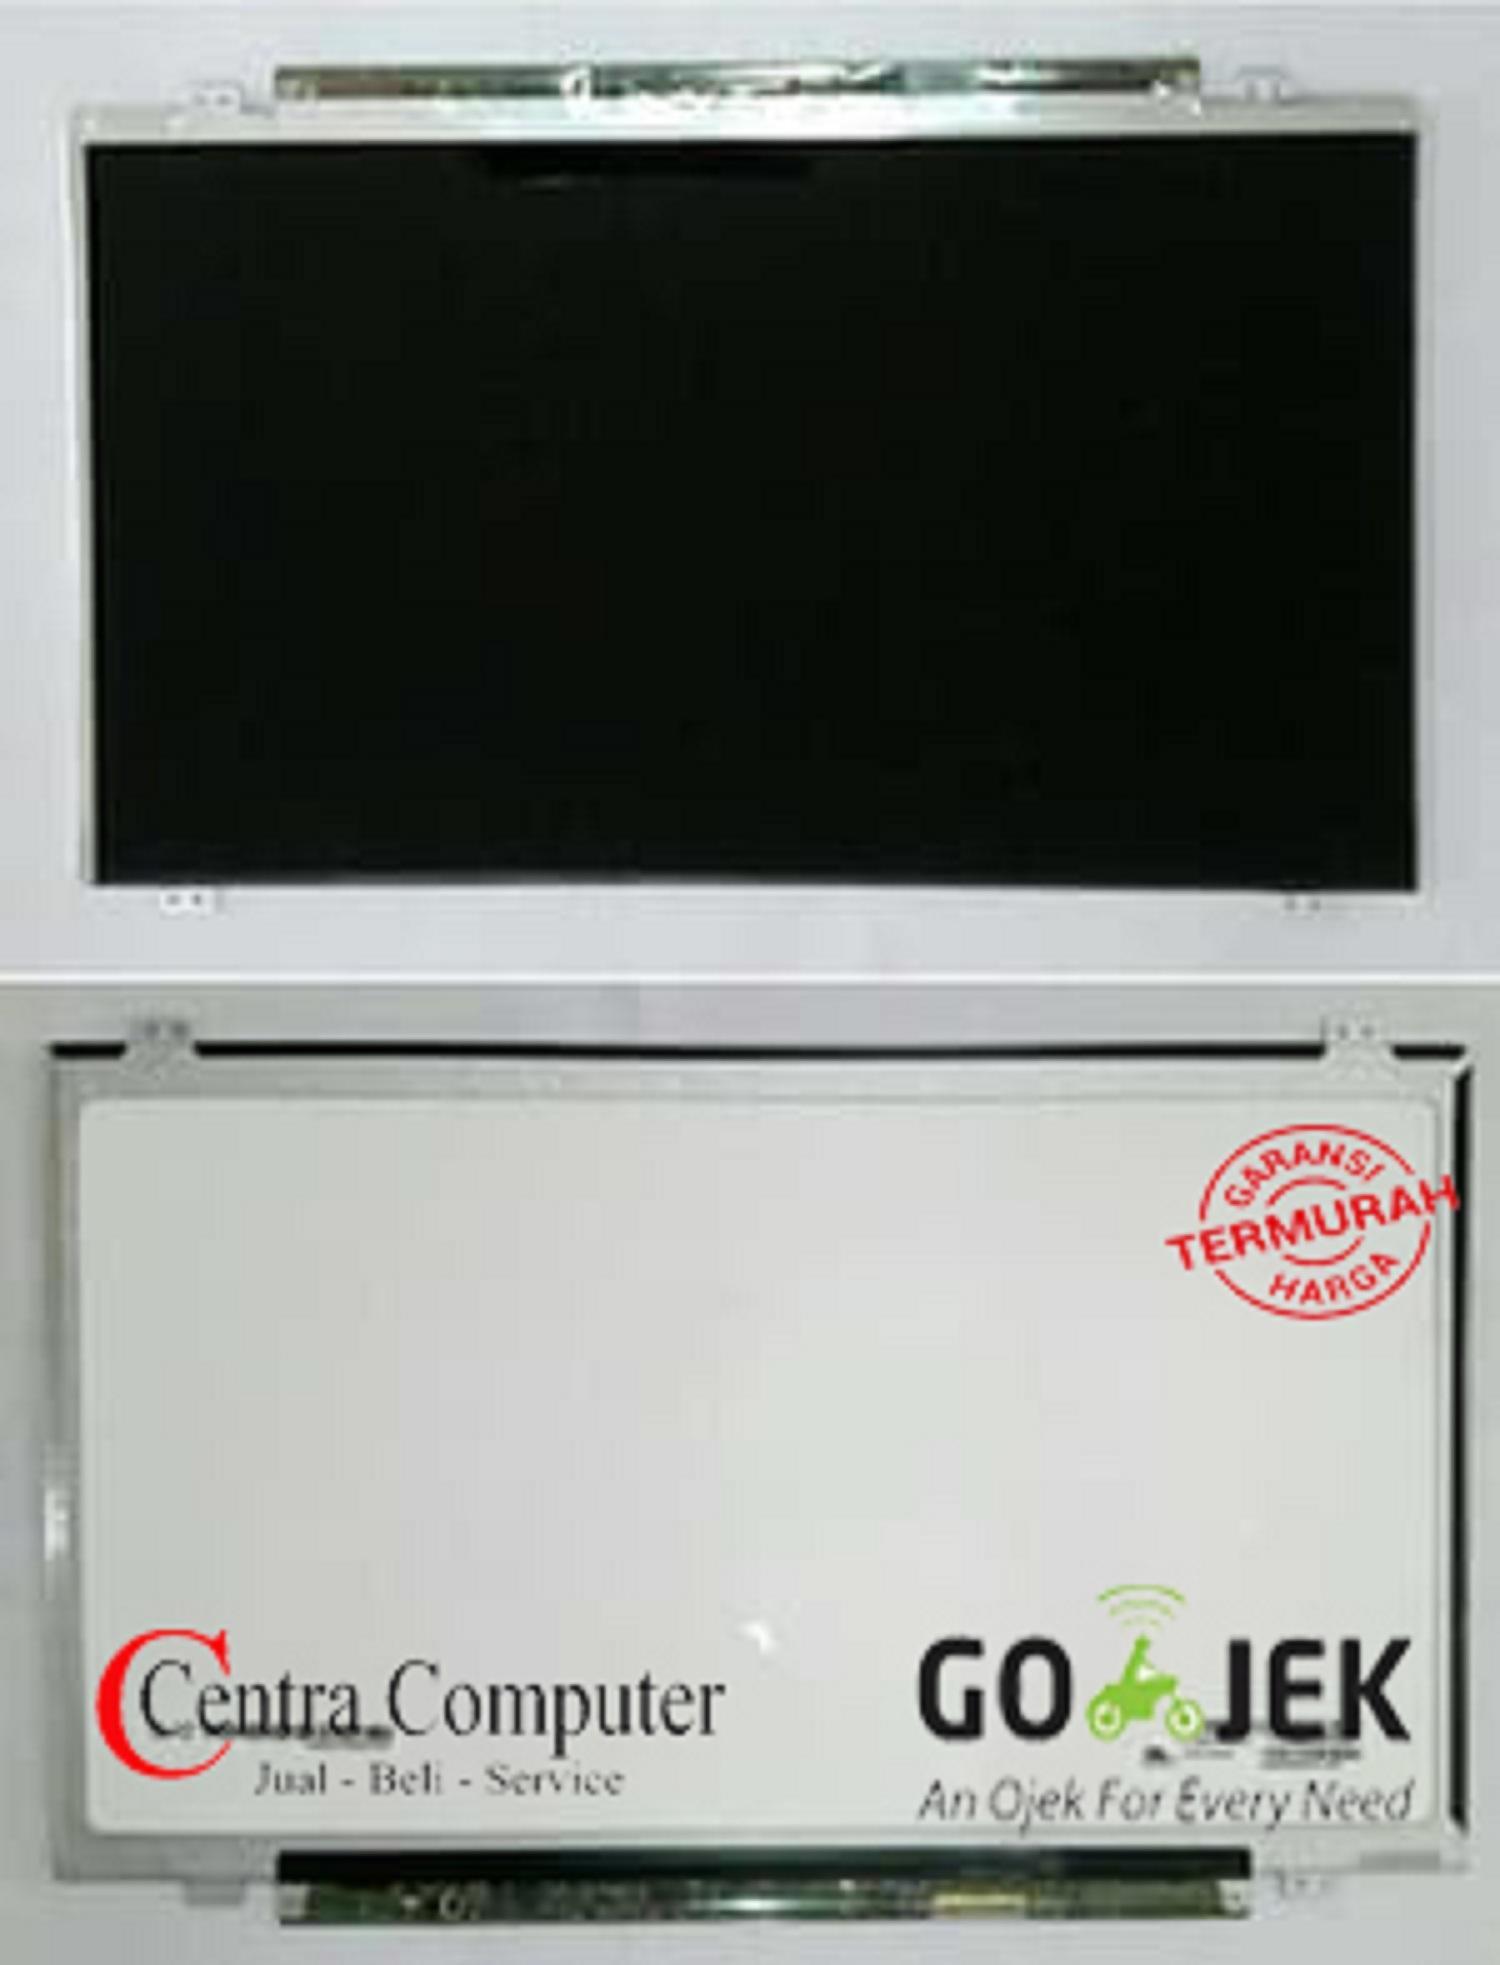 LCD Laptop Asus X401U, X450C, X453M, A46C, A46S, A450C (beda dgn A450L), S400C, A455L, X453M